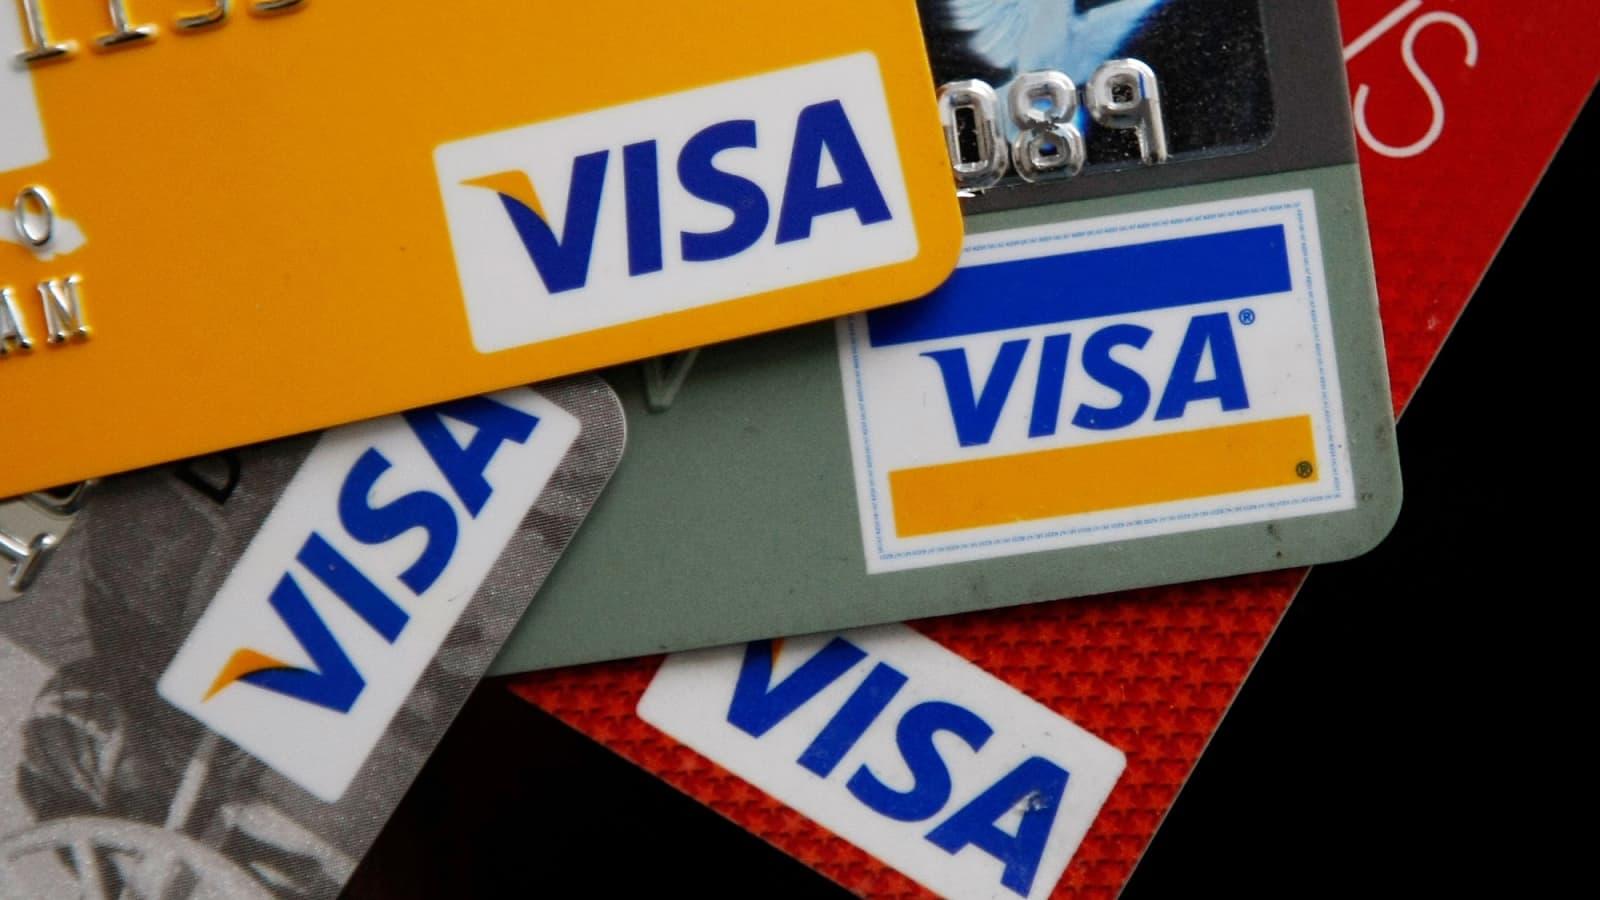 Visa quarterly profit rises 10 percent